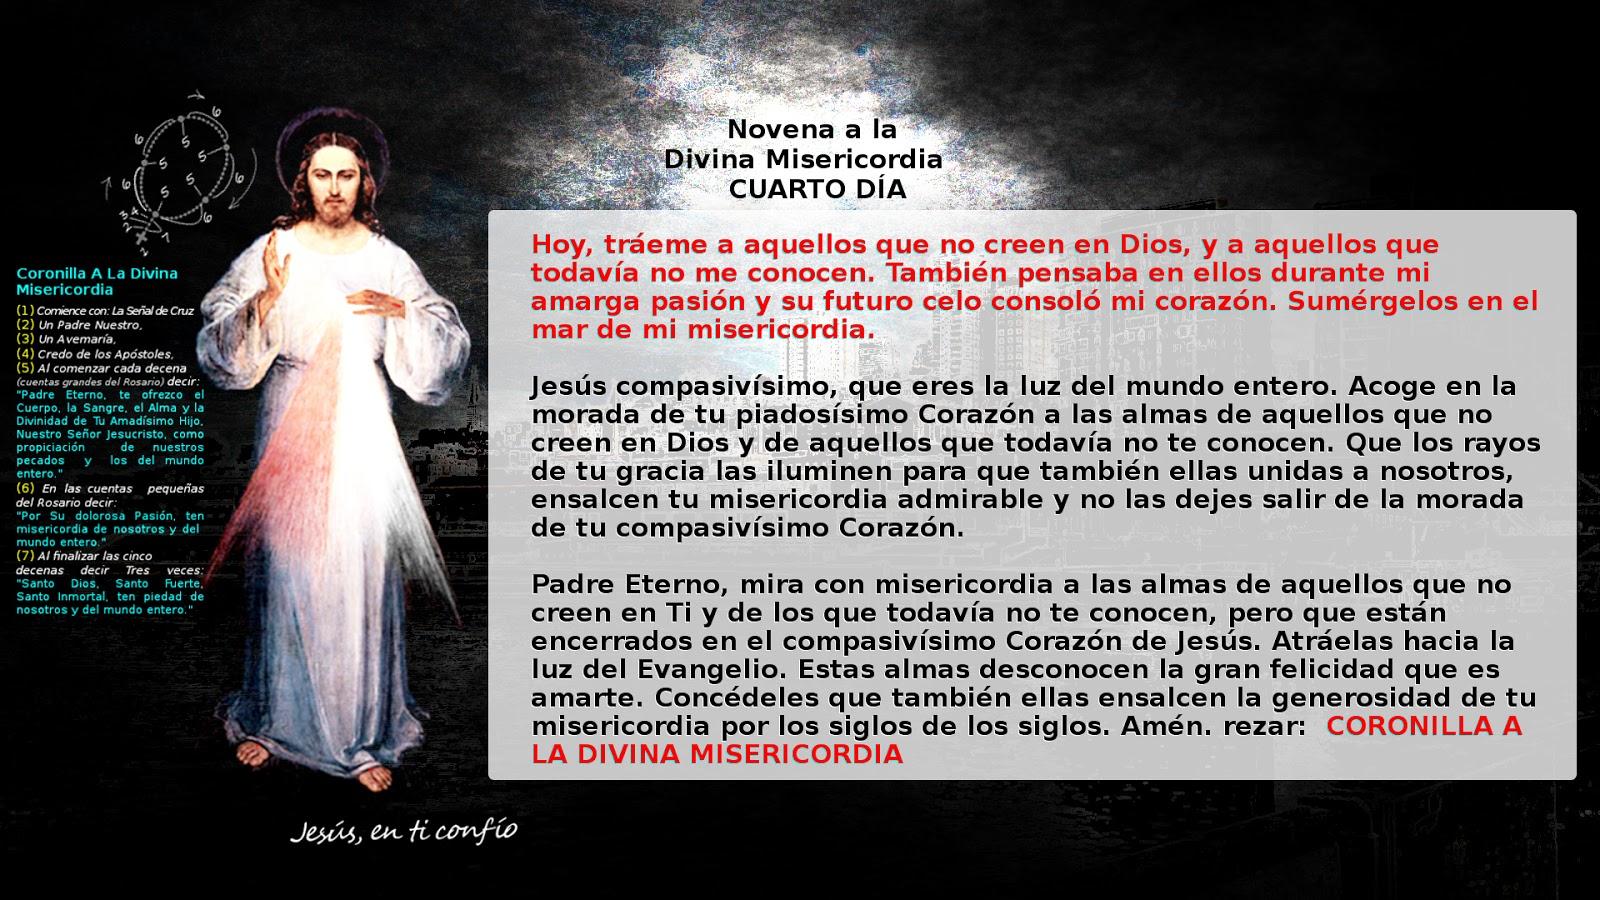 fotos con nevena divina misericordia 2017 cuarto dia